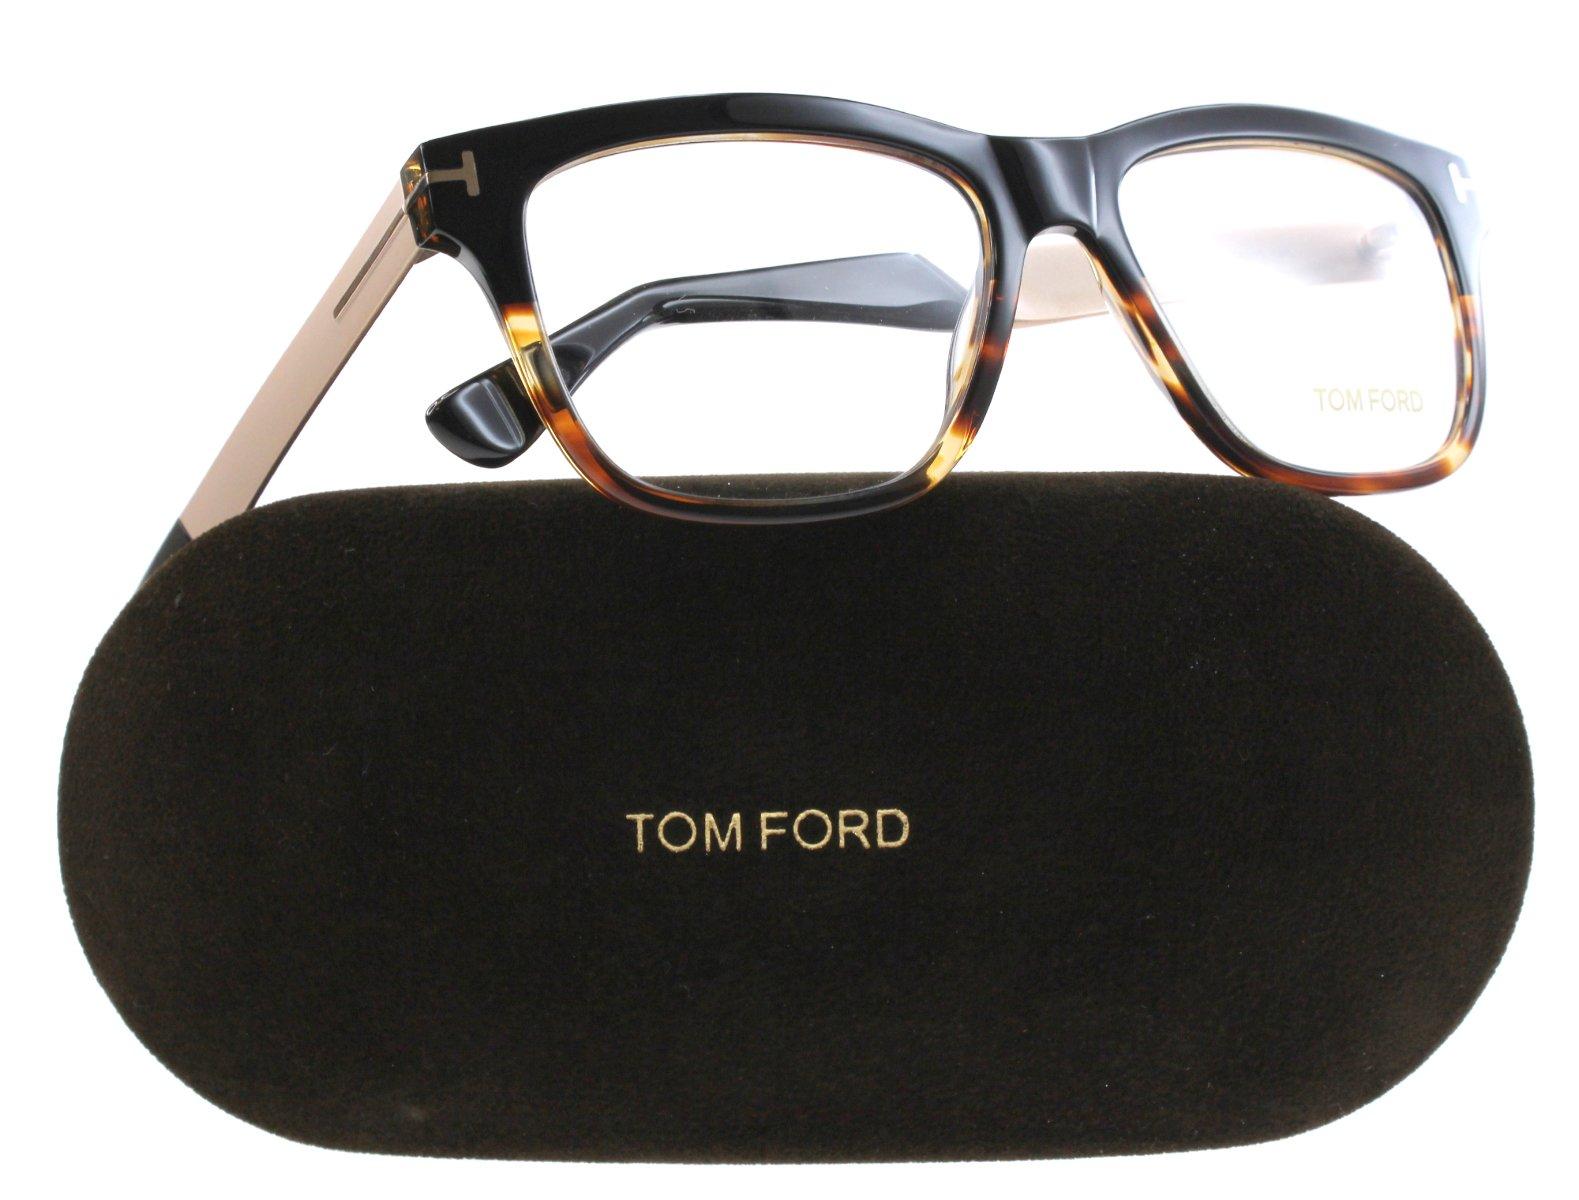 Eyeglasses Tom Ford FT 5372 005 black/other